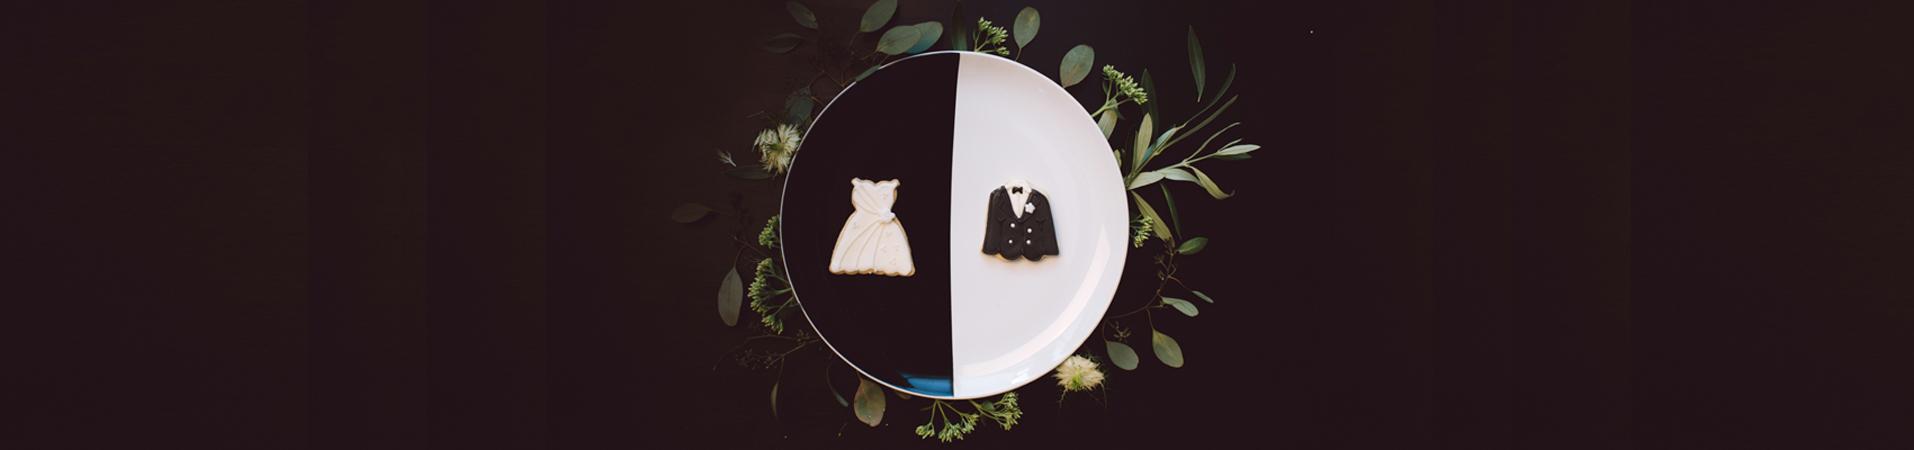 wedding planner sposo sposa